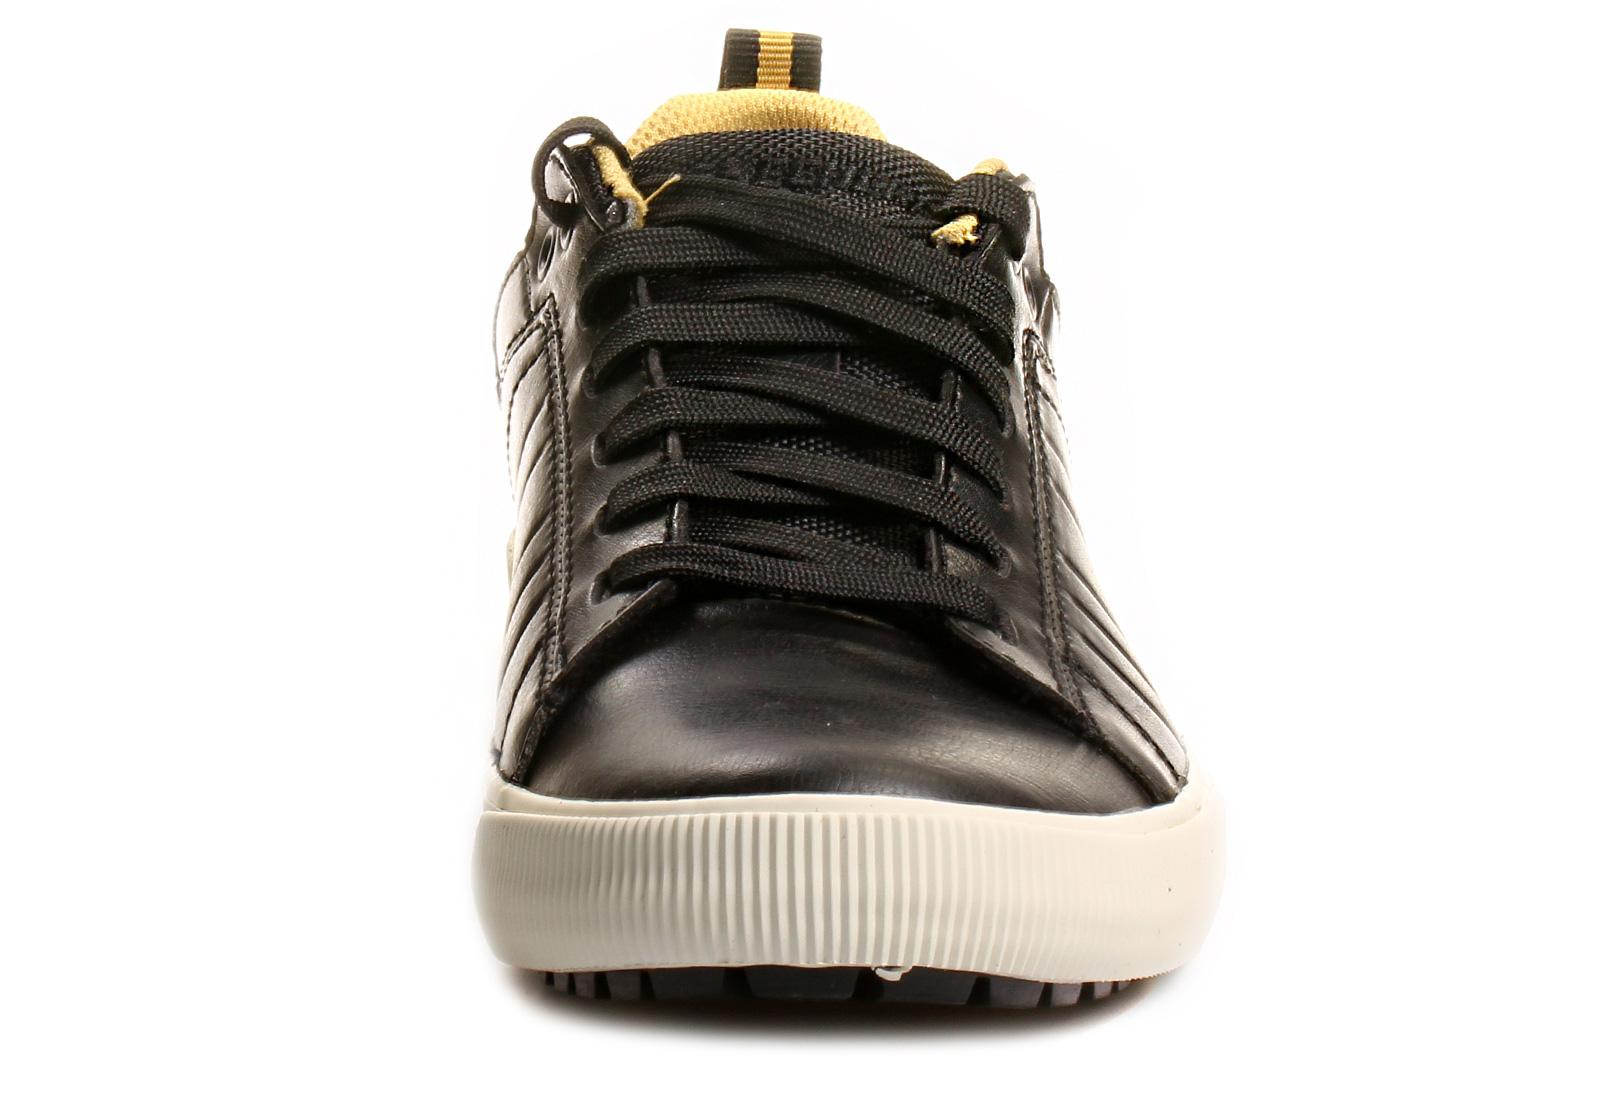 Skechers Shoes Talon Kane 63612 Blk Online Shop For